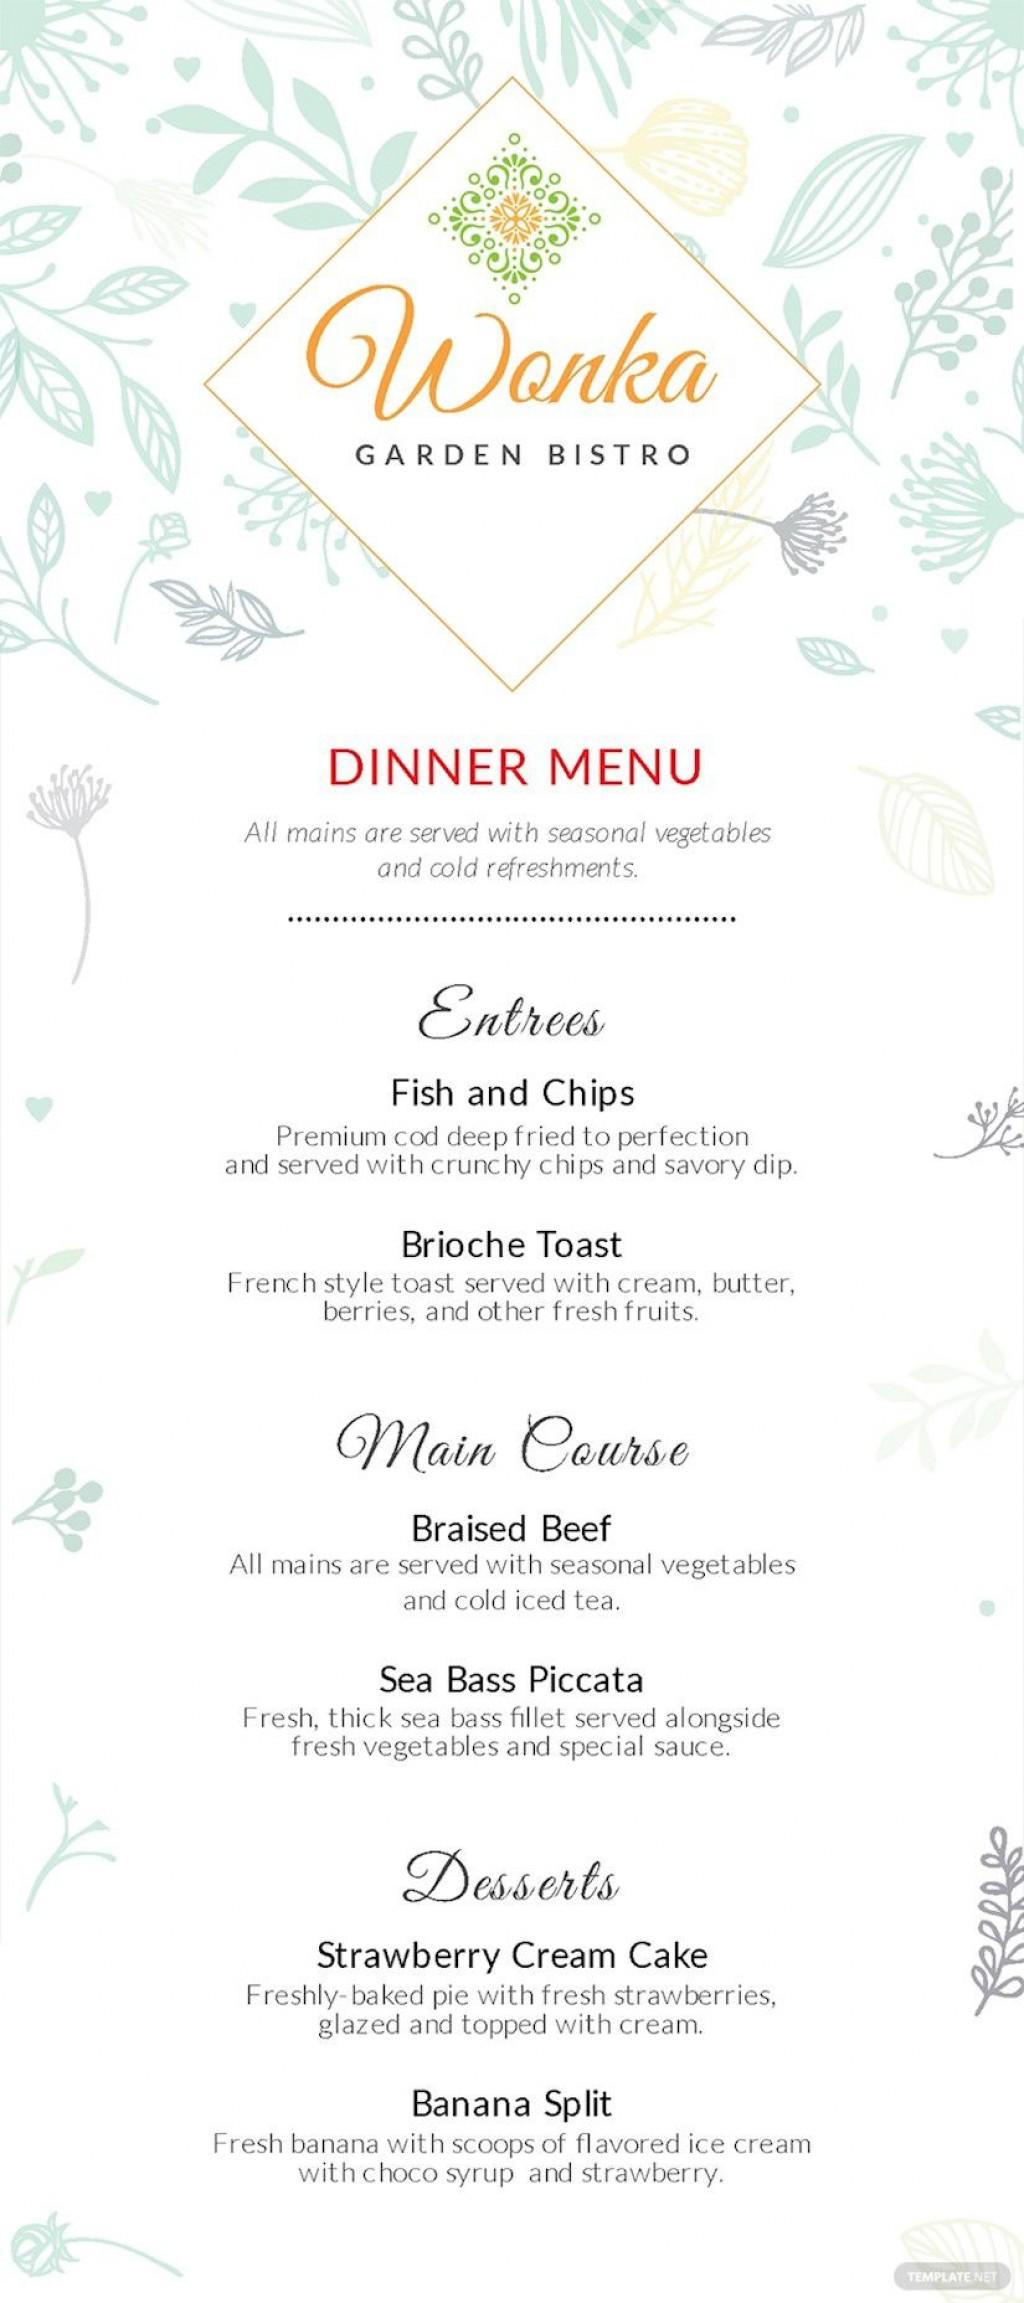 005 Shocking Dinner Party Menu Template High Def  Word Elegant Free Google DocLarge